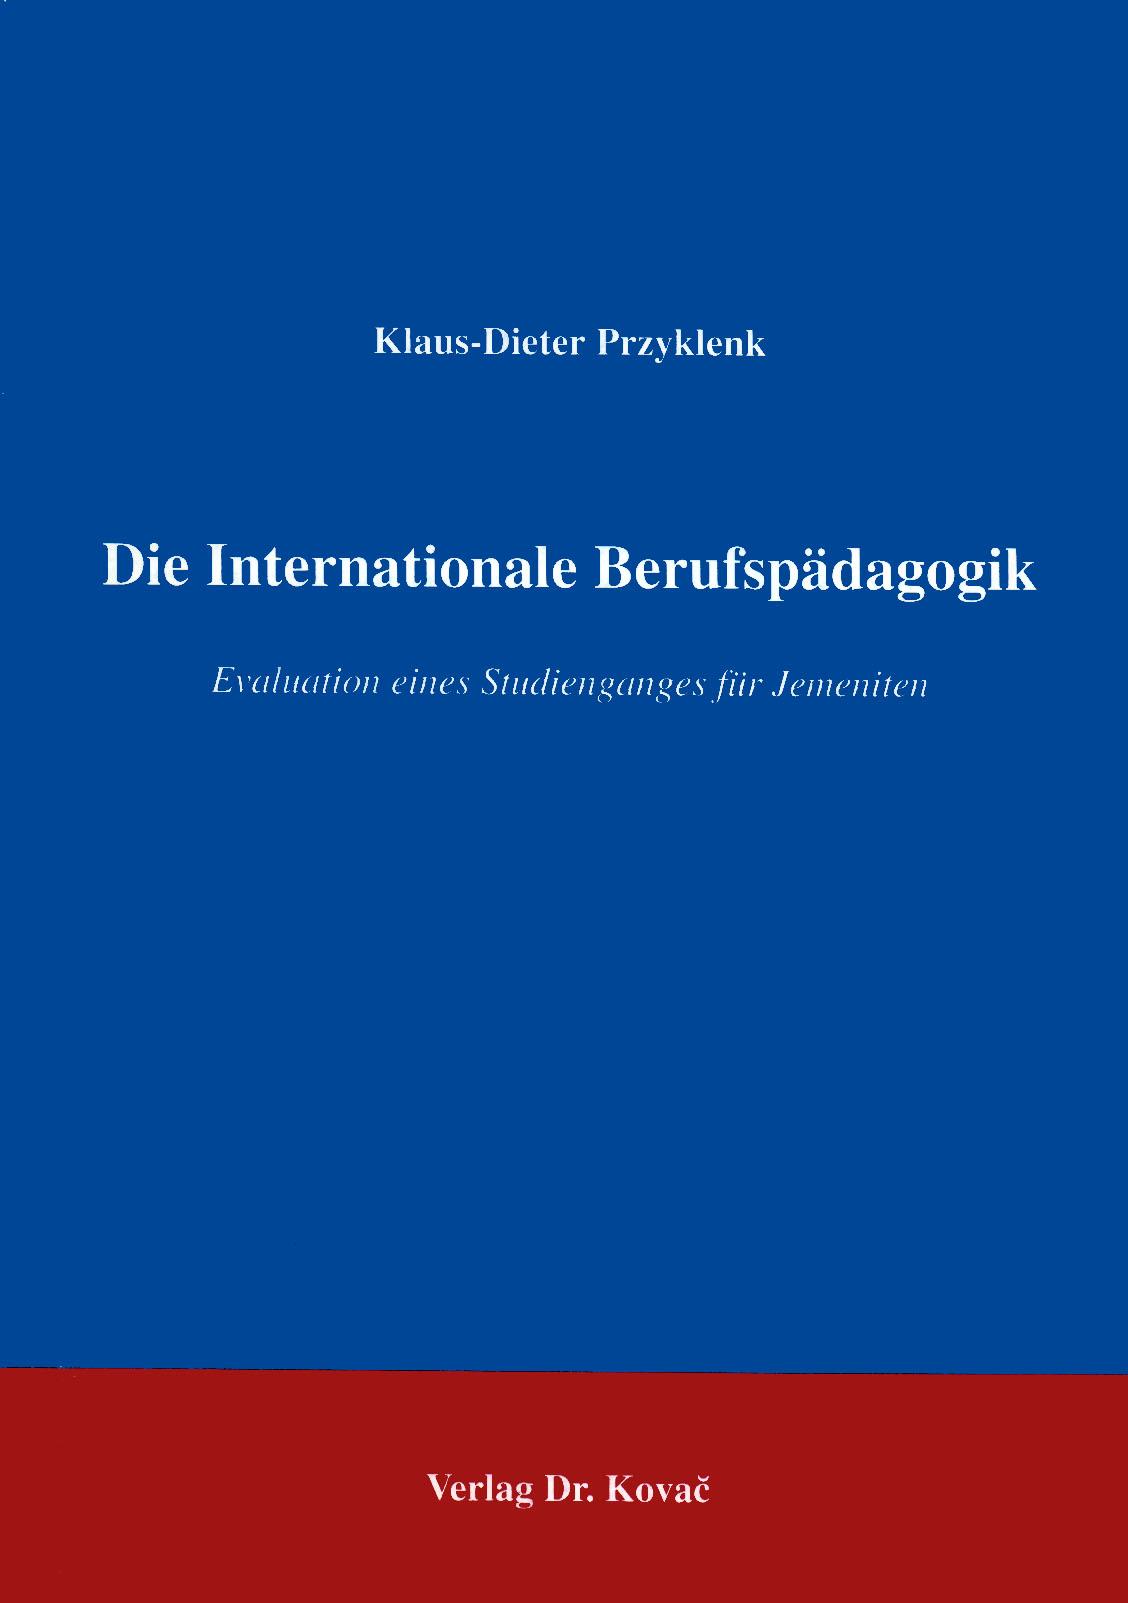 Cover: Die Internationale Berufspädagogik